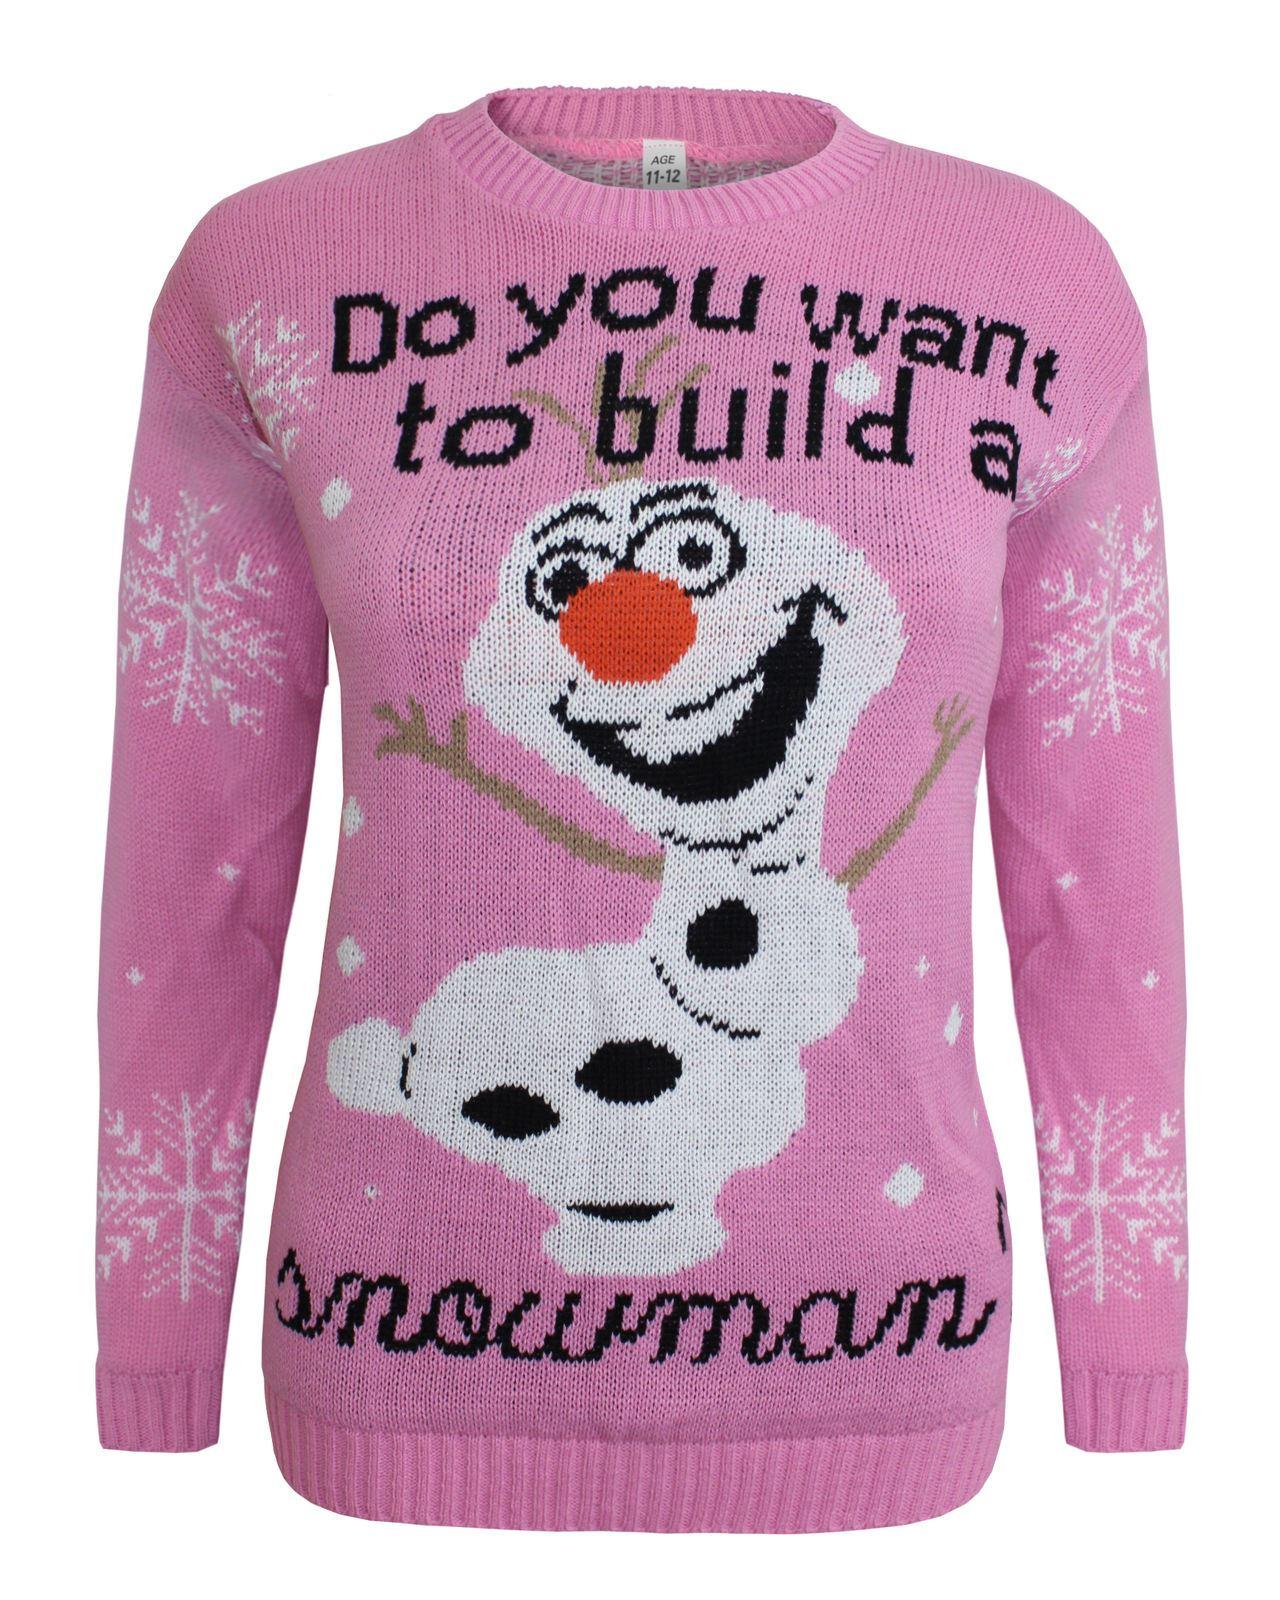 Kids Knitted Reindeer Turtle Ninja Christmas Jumper Xmas Olaf ...